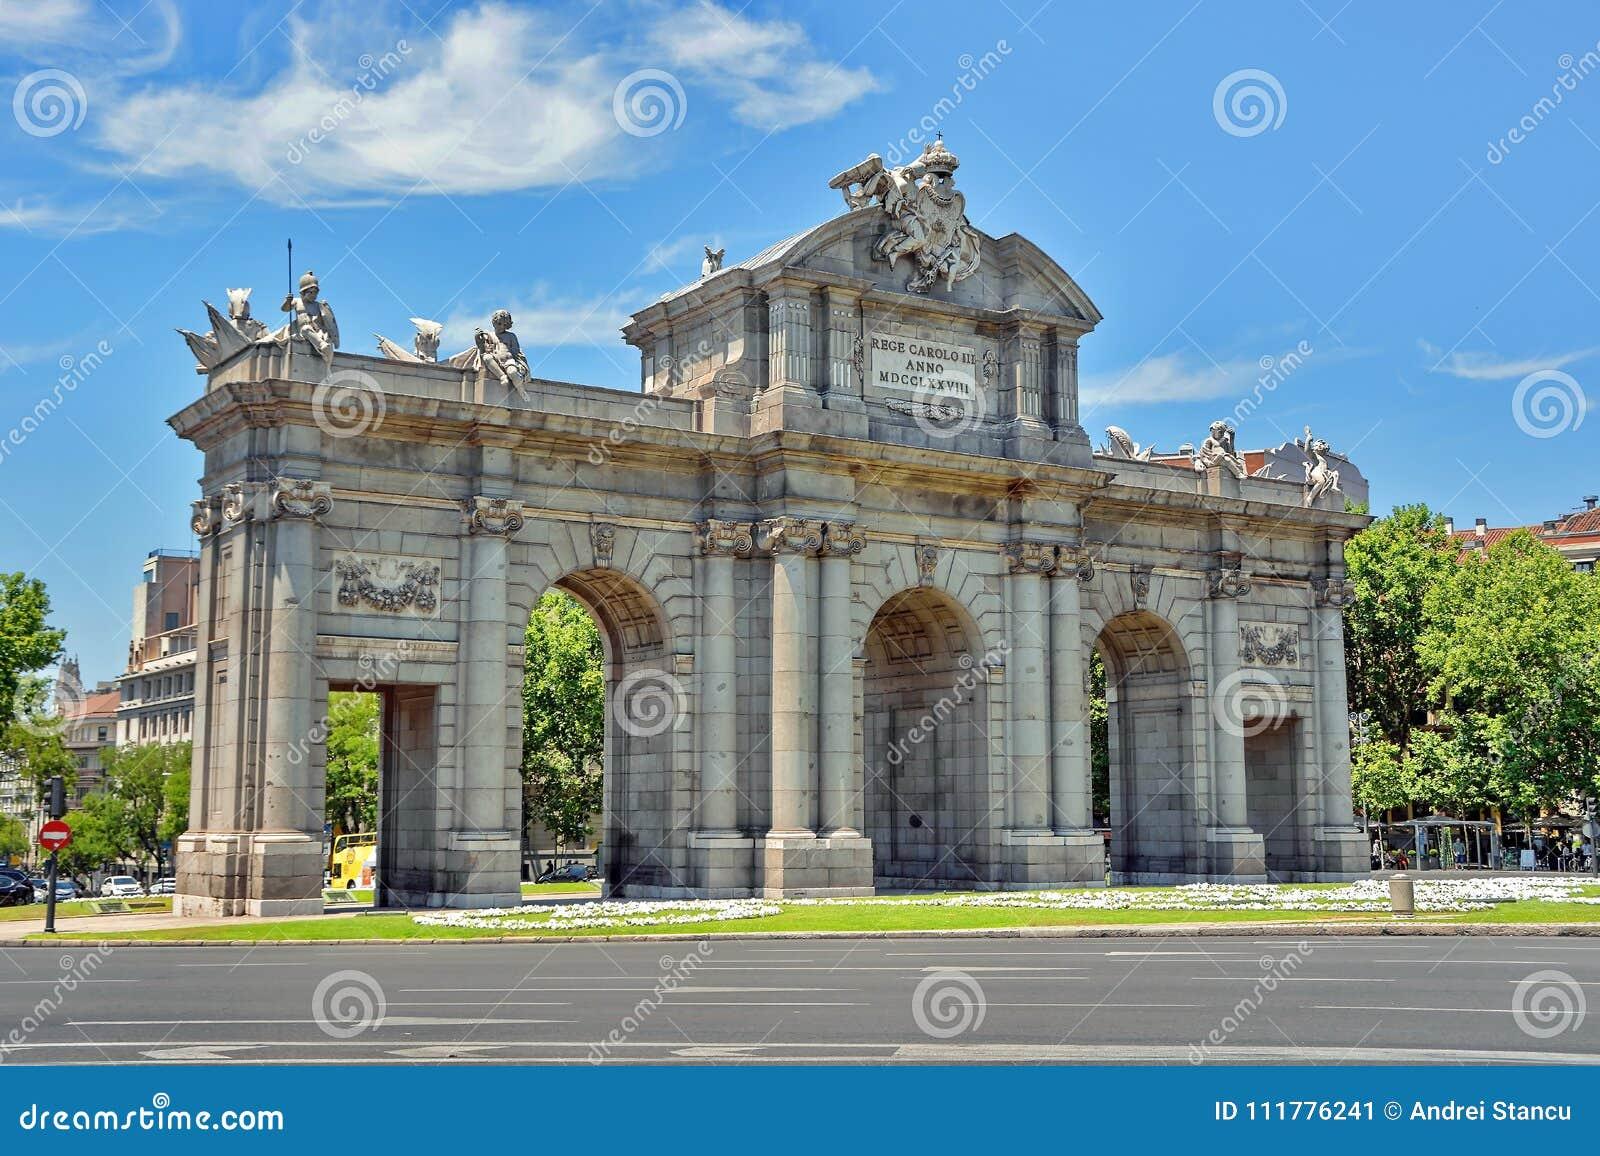 Alcala Gate in Madrid, Spain